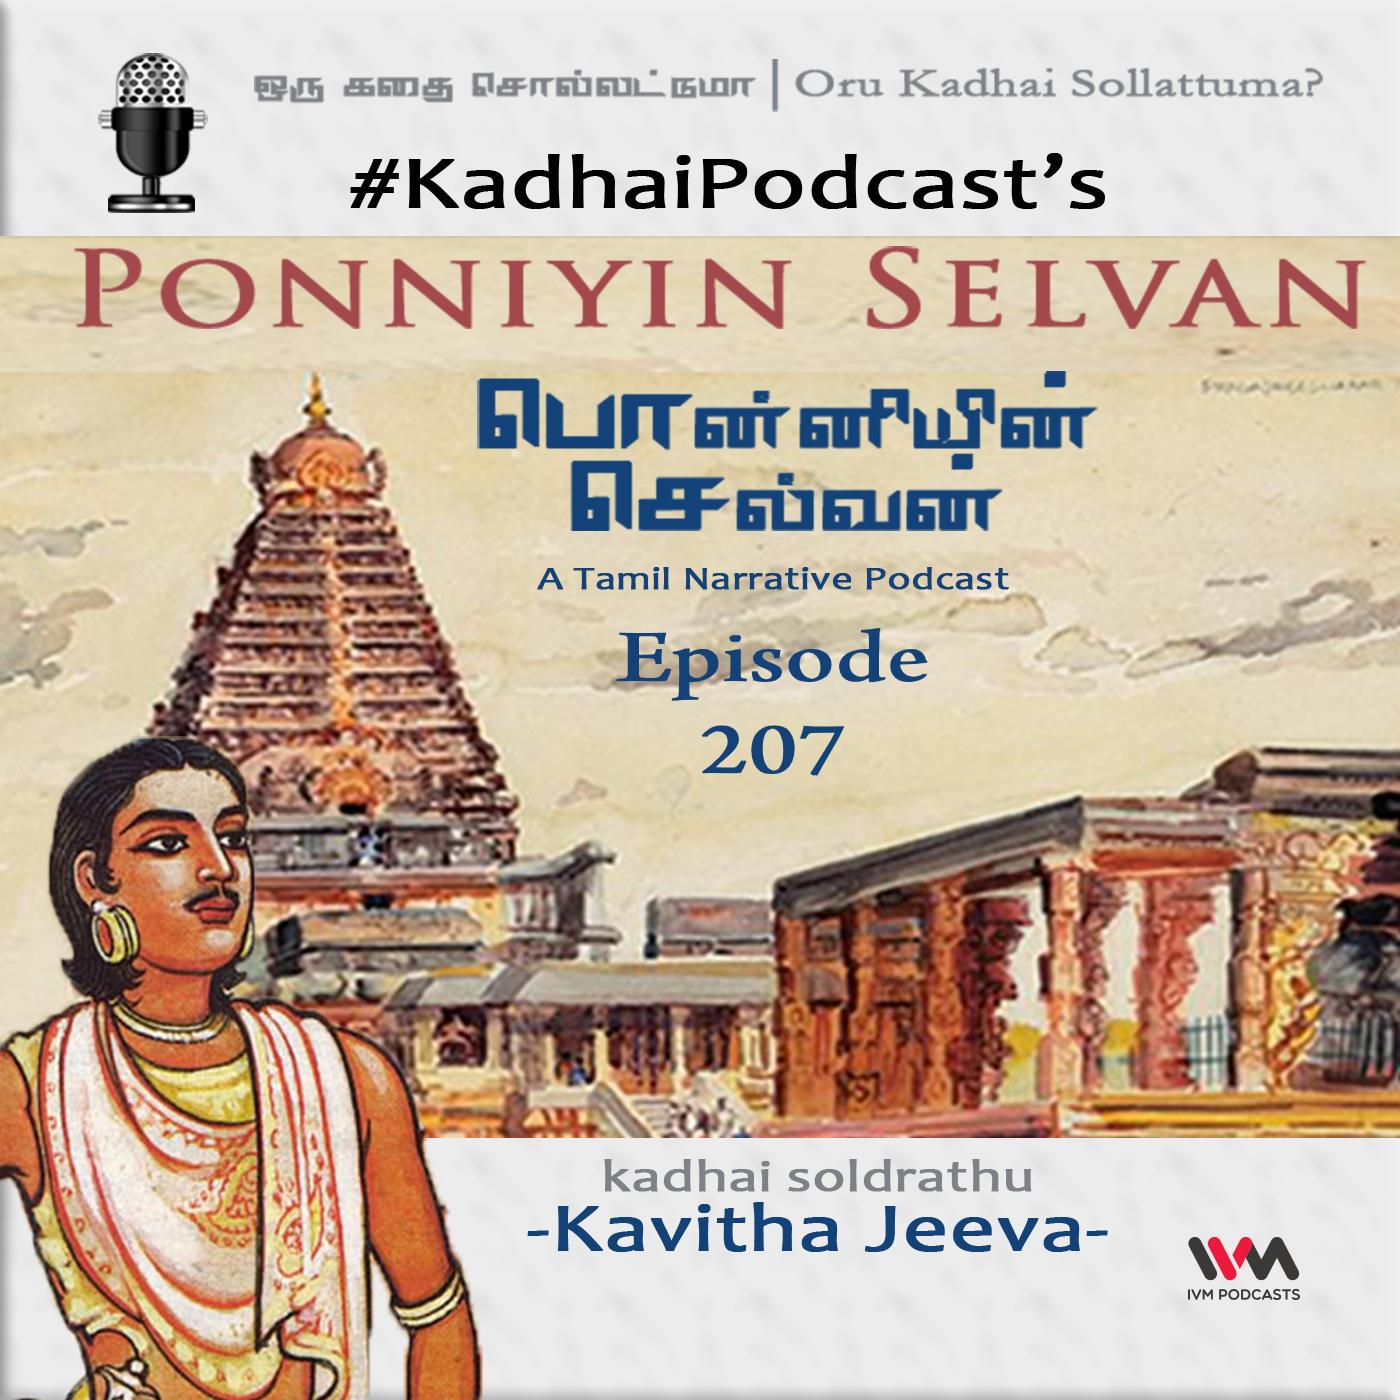 KadhaiPodcast's Ponniyin Selvan - Episode # 207